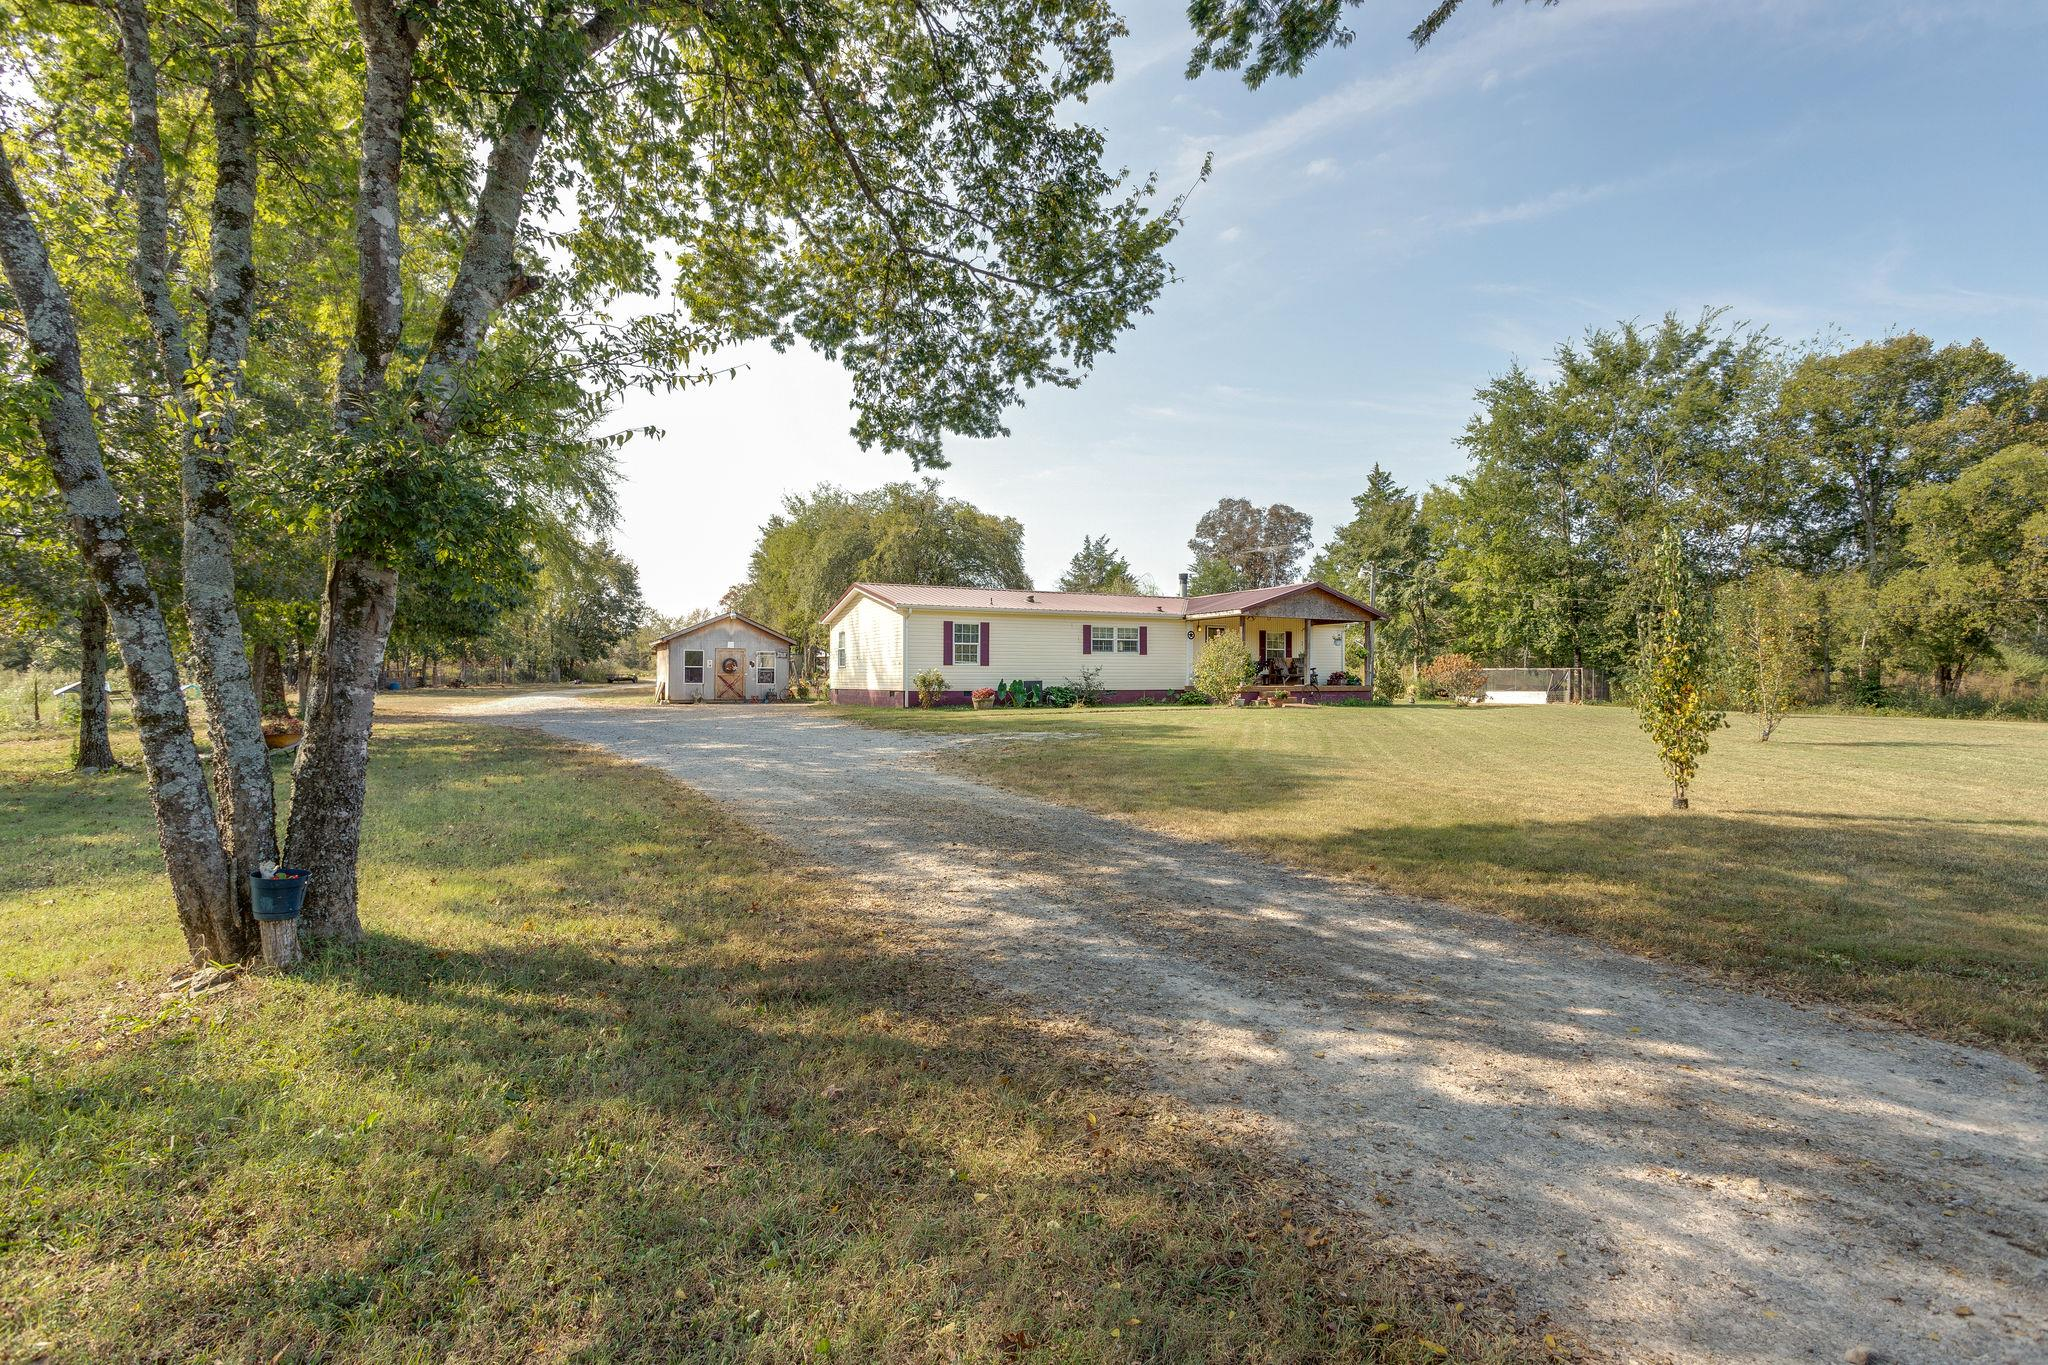 3365 Hopkins Bridge Rd, Unionville, TN 37180 - Unionville, TN real estate listing